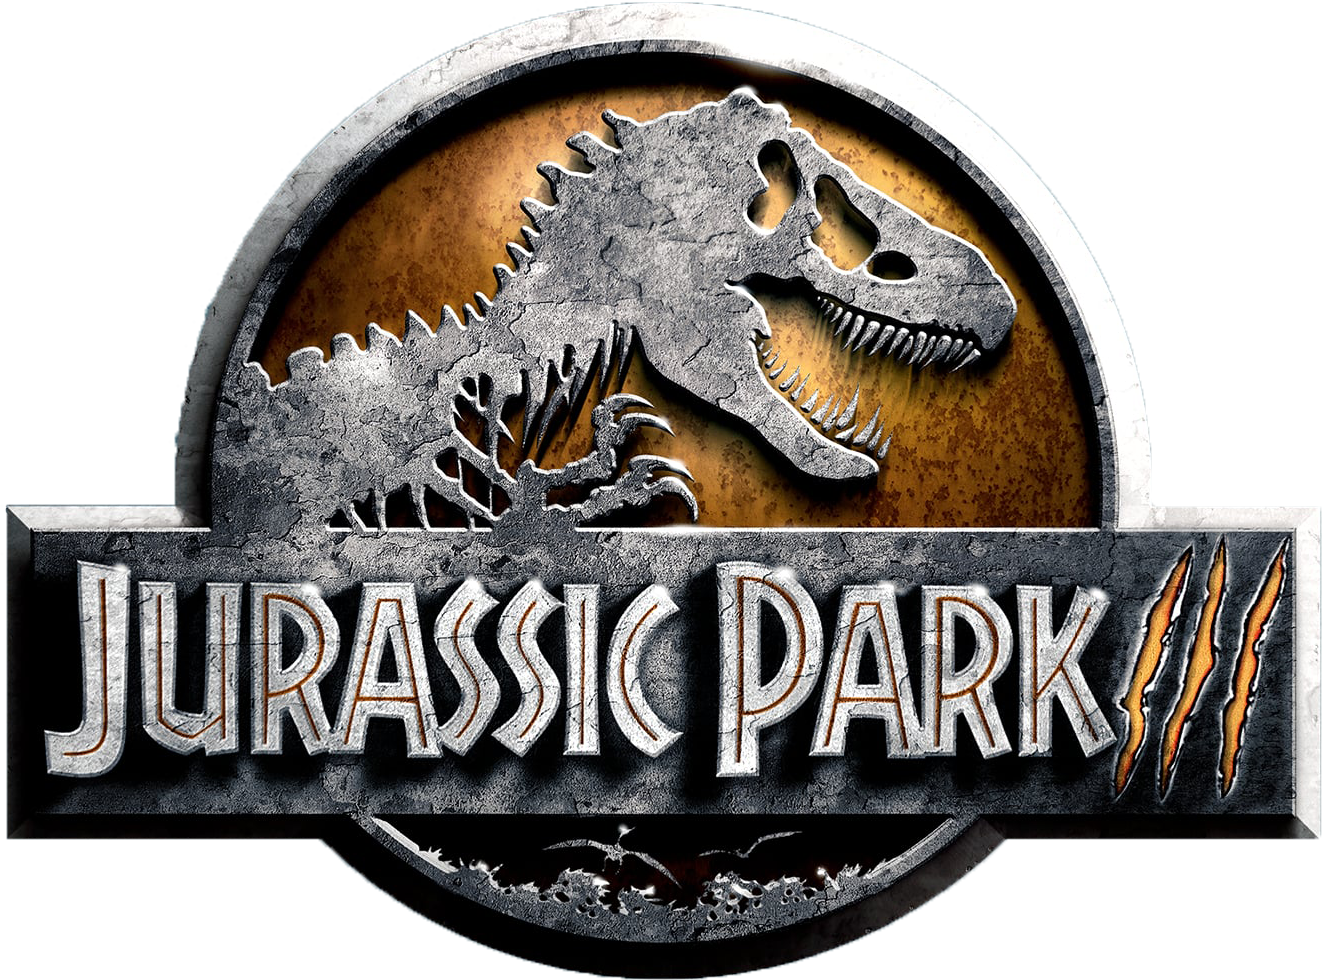 Jurassic park iii (2001) full movie download free. full